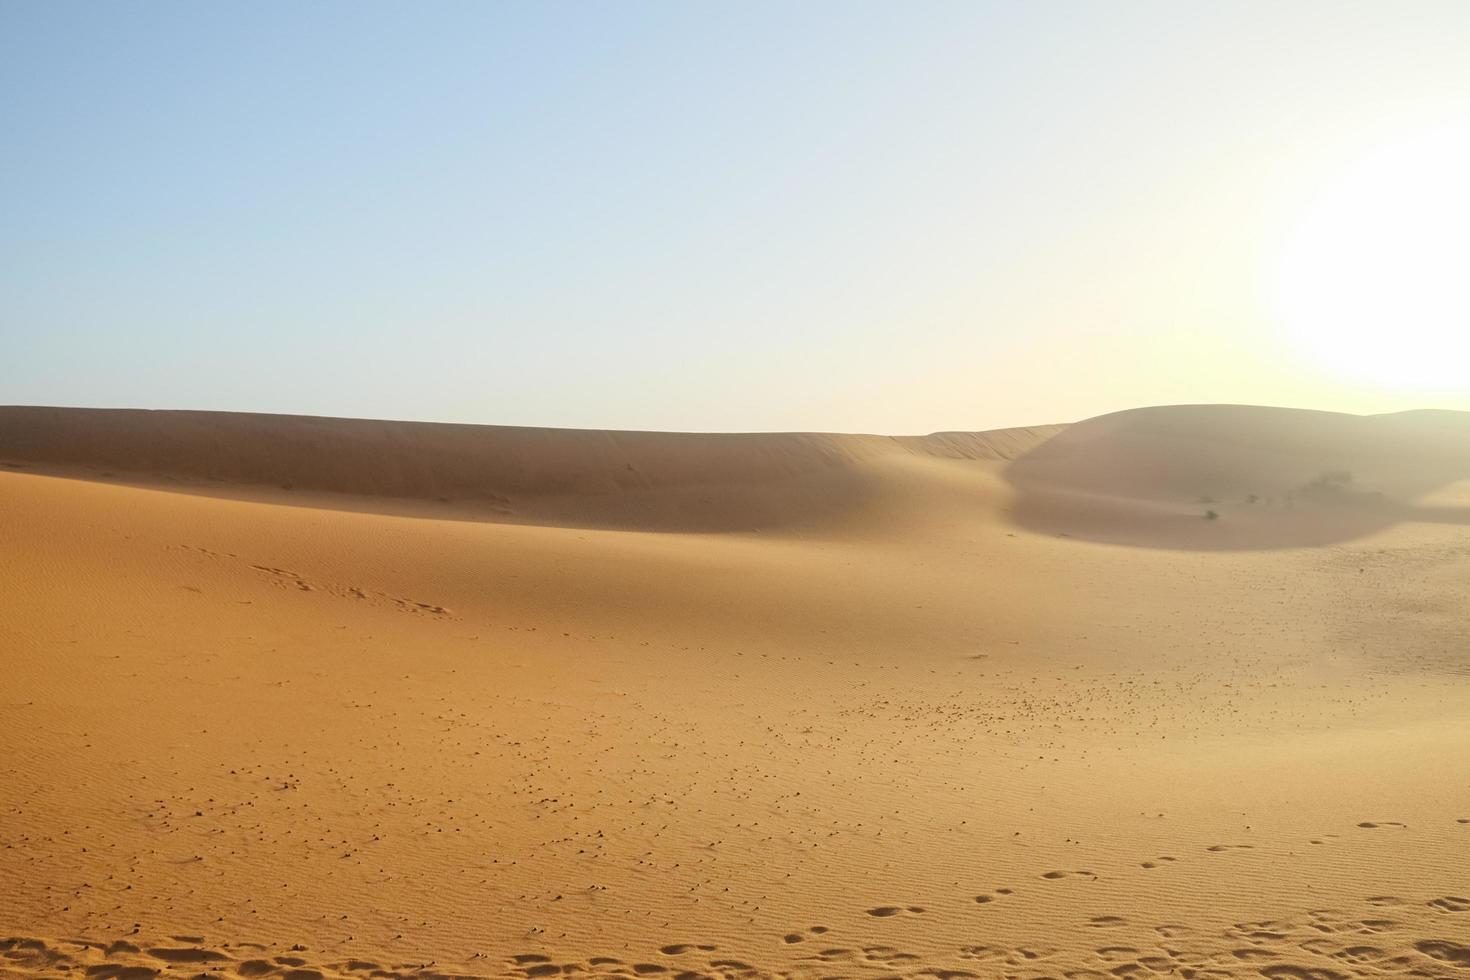 erg chebbi zandduinen met heldere blauwe lucht foto